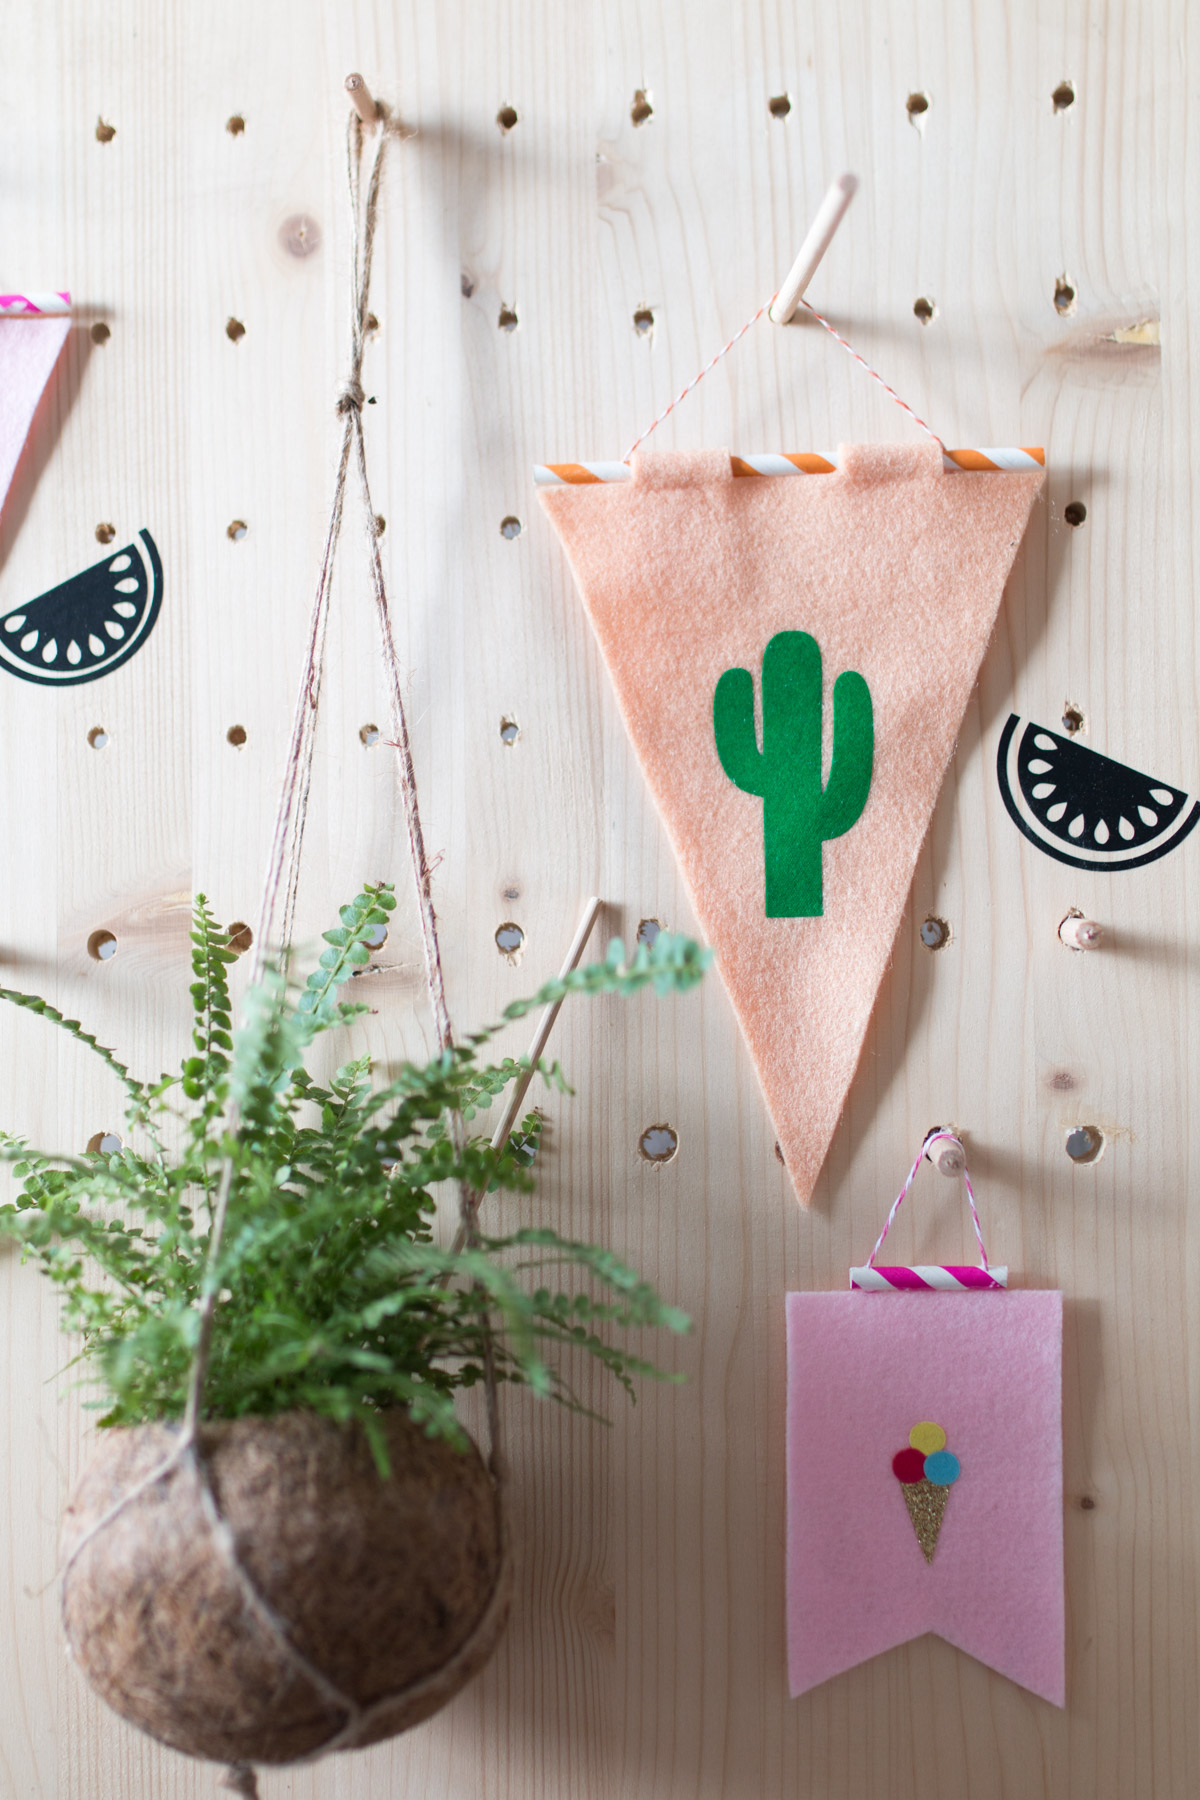 DIY fanion cactus et glace I Sp4nkblog